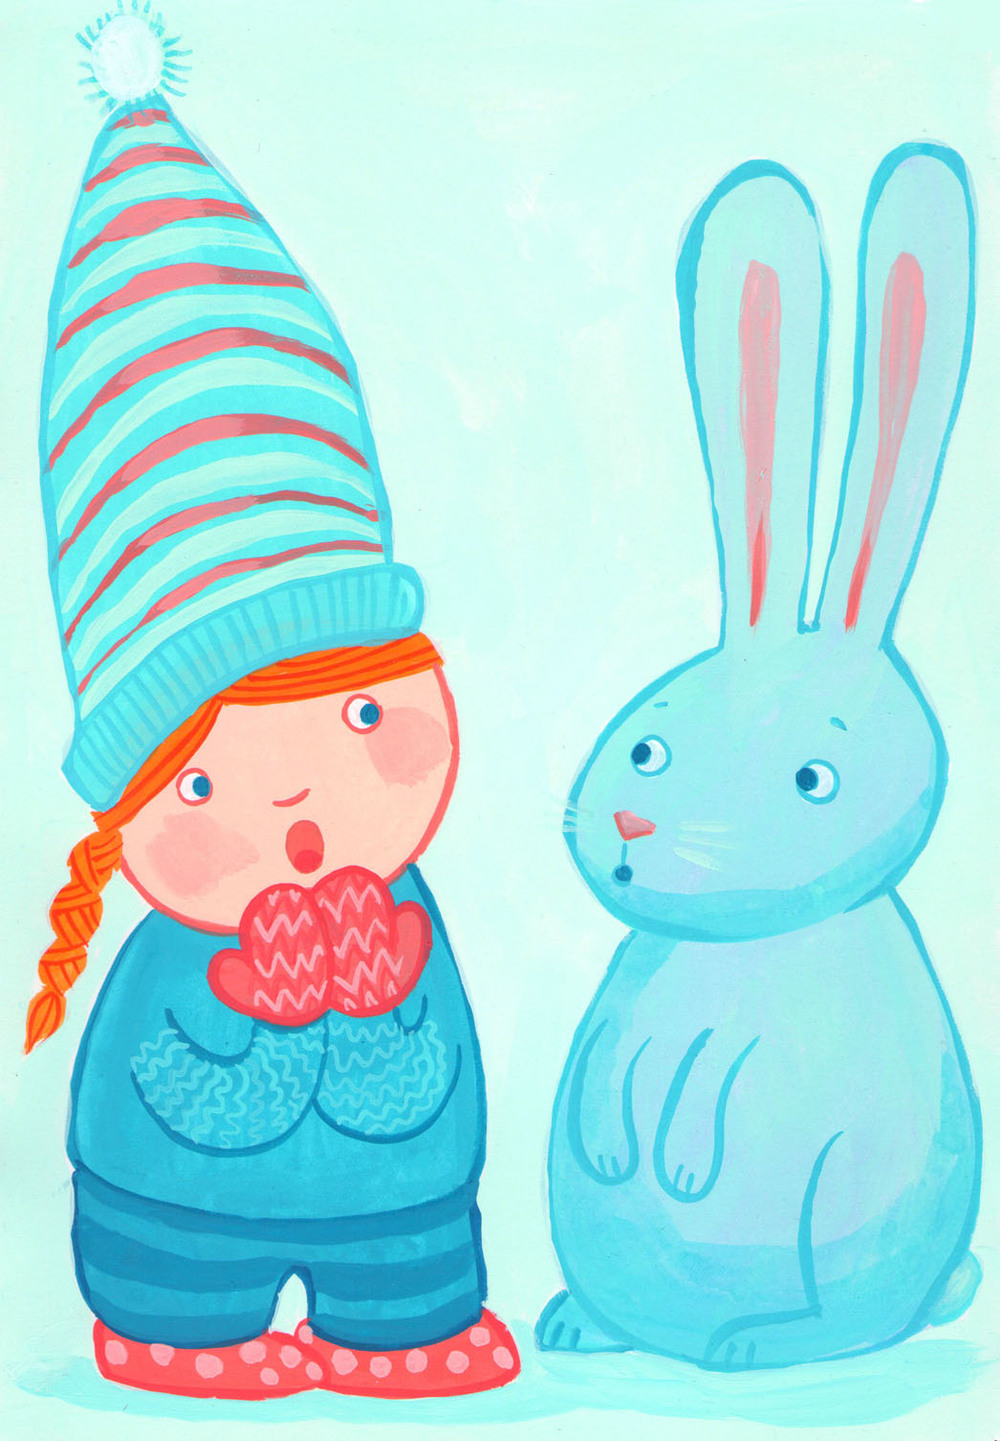 blue-bunny-sm.jpg